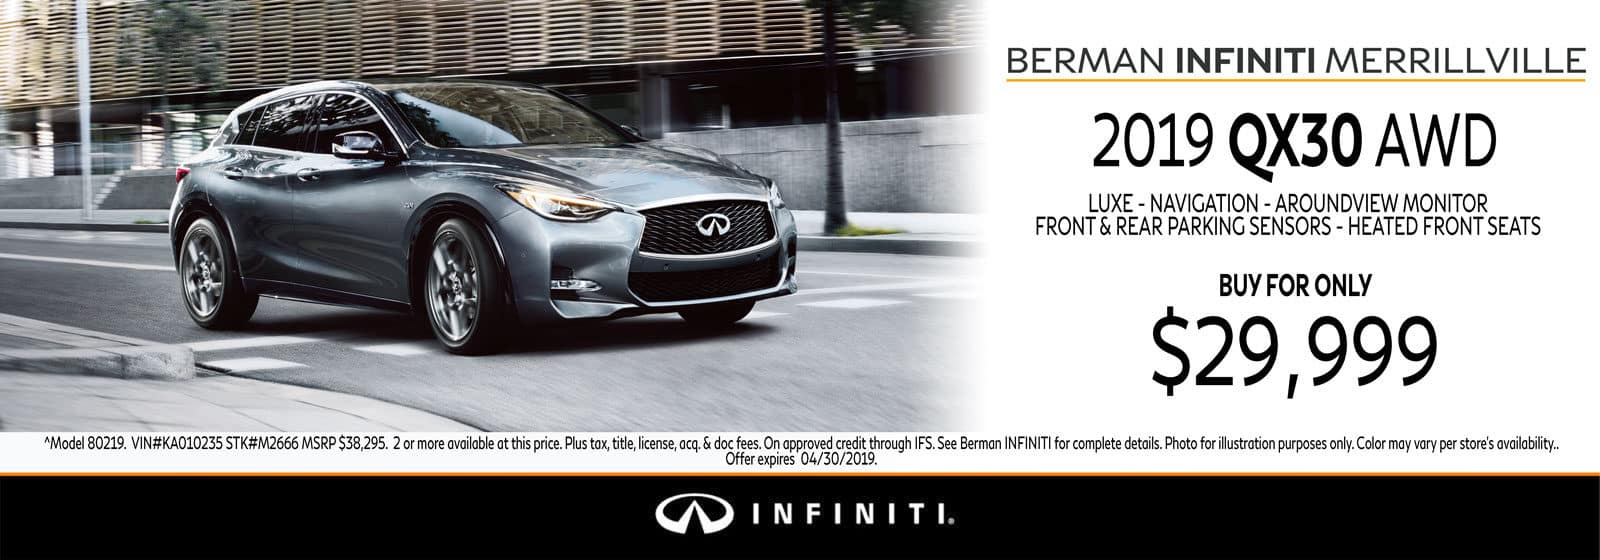 New 2019 INFINITI QX30 April Offer at Berman INFINITI of Merrillville!